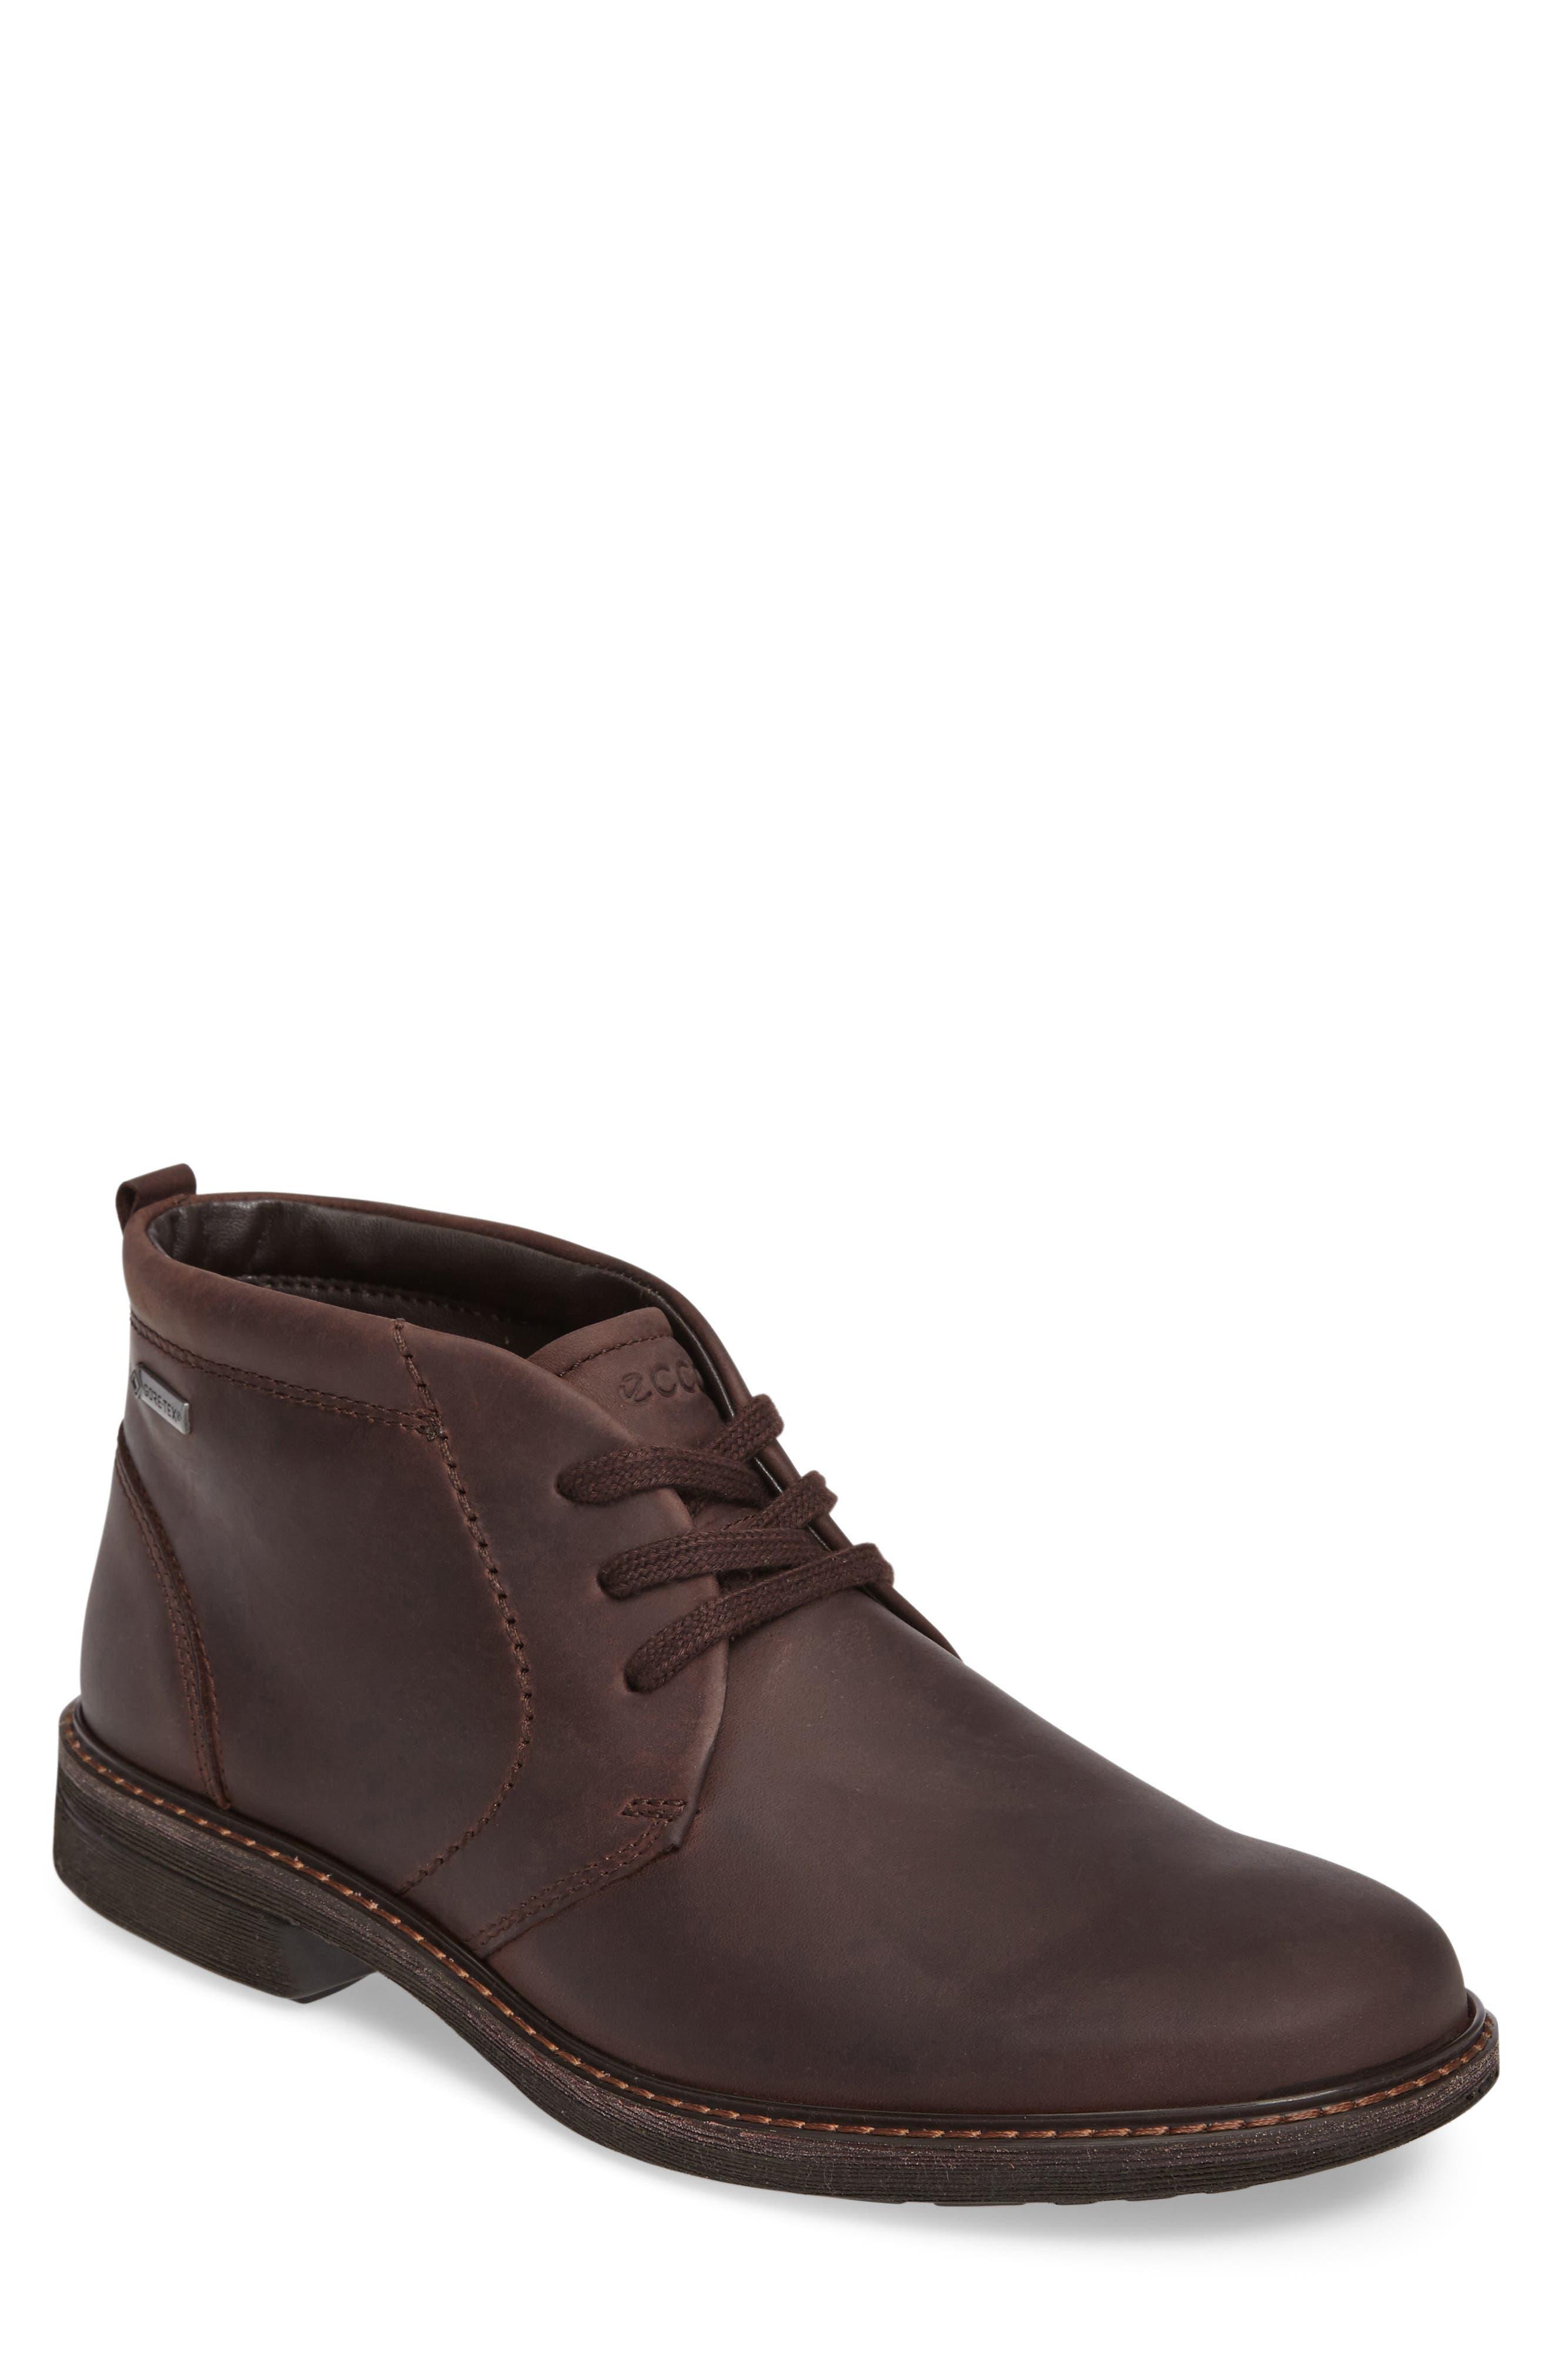 ECCO Zapatos Nordstrom for Hombre  Nordstrom Zapatos 22917b